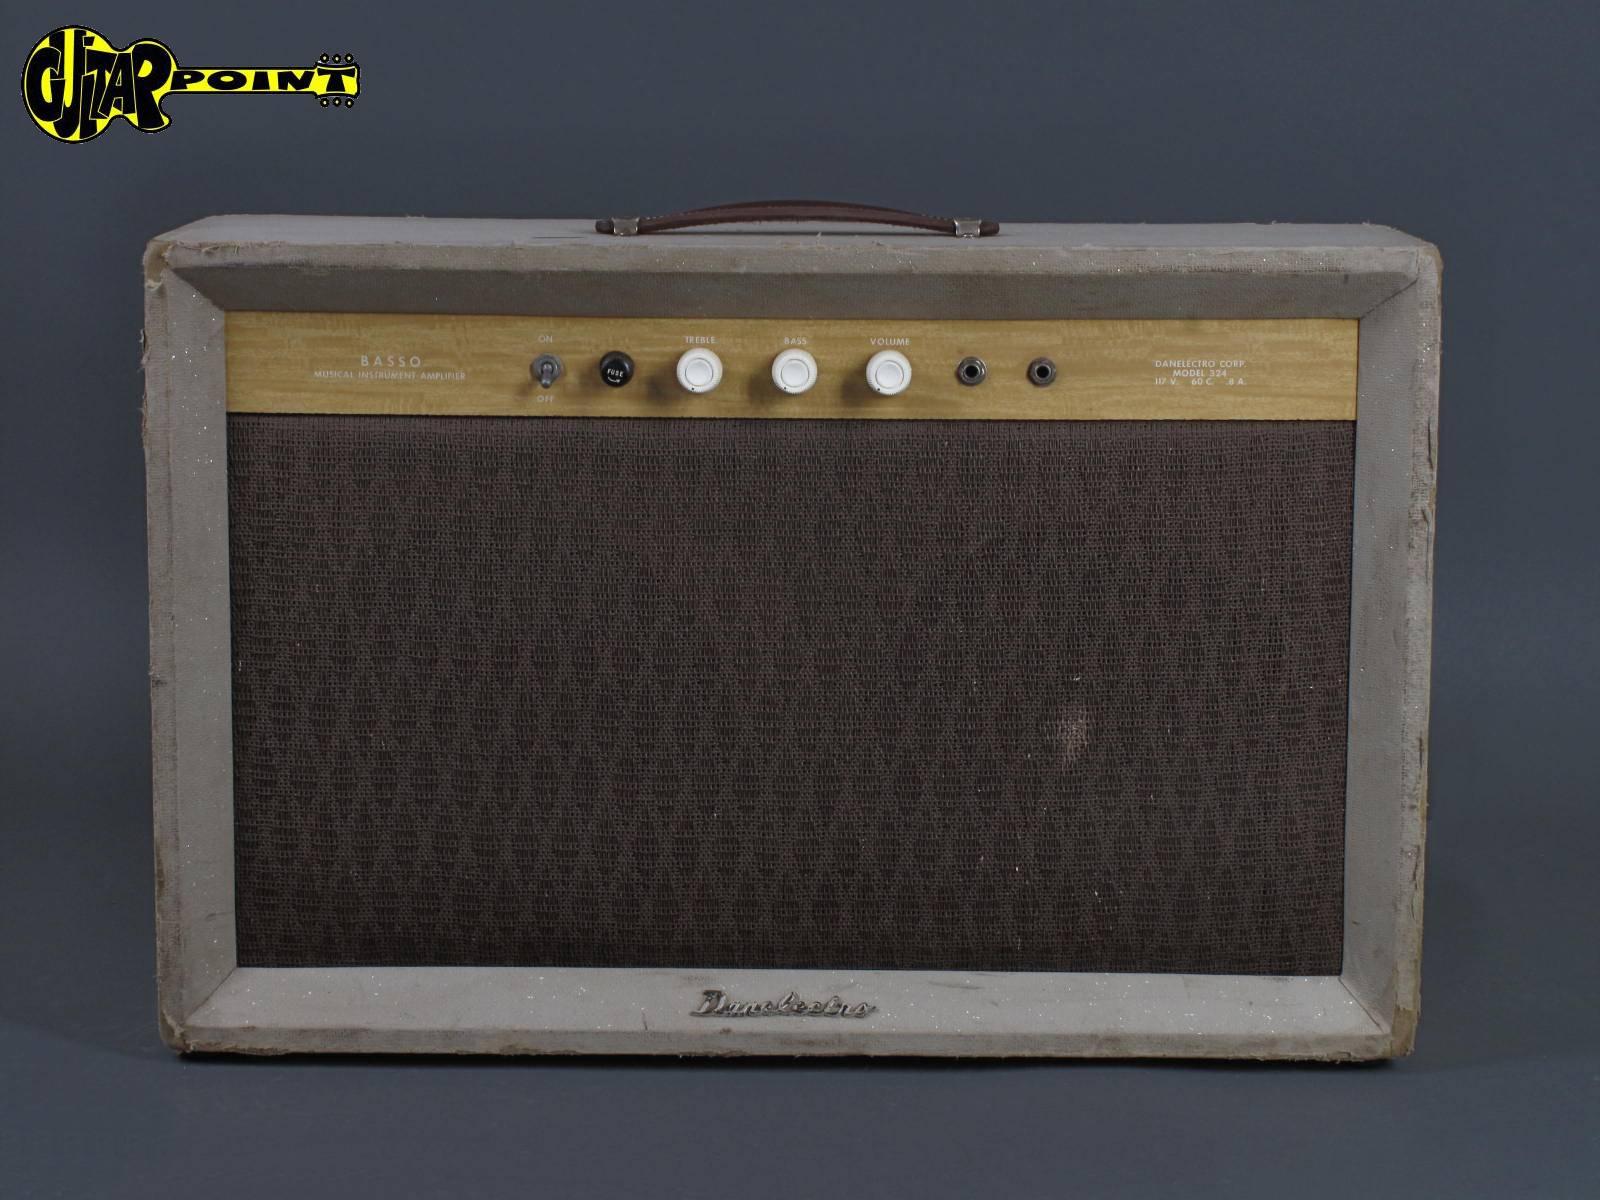 1960 Danelectro Basso Model 324 - Tube Amplifier